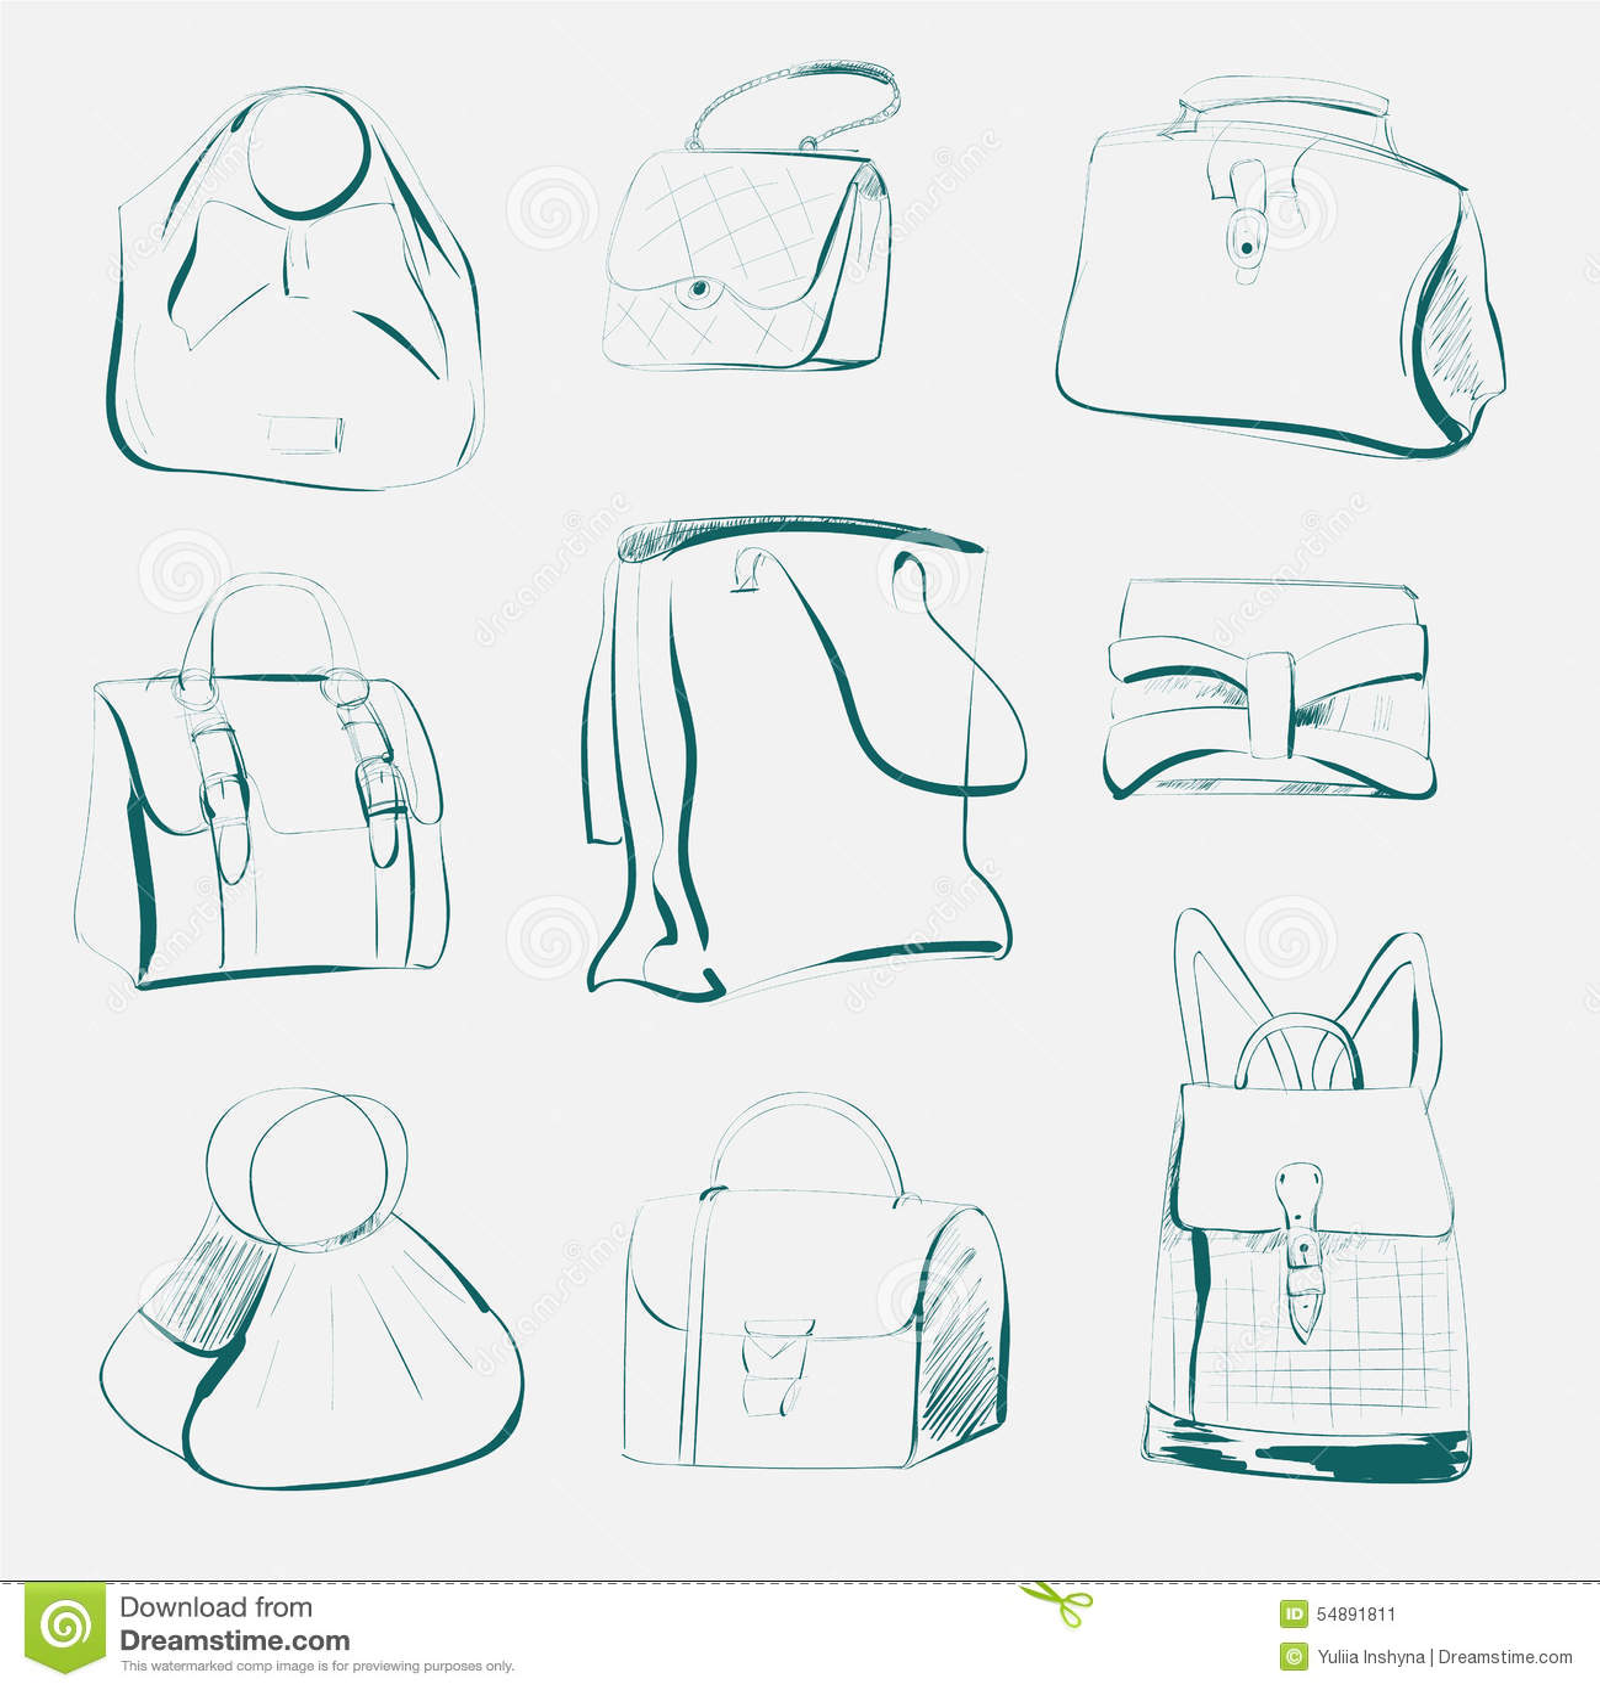 b6ed80eafa06c Satz verschiedene modische Handtaschen